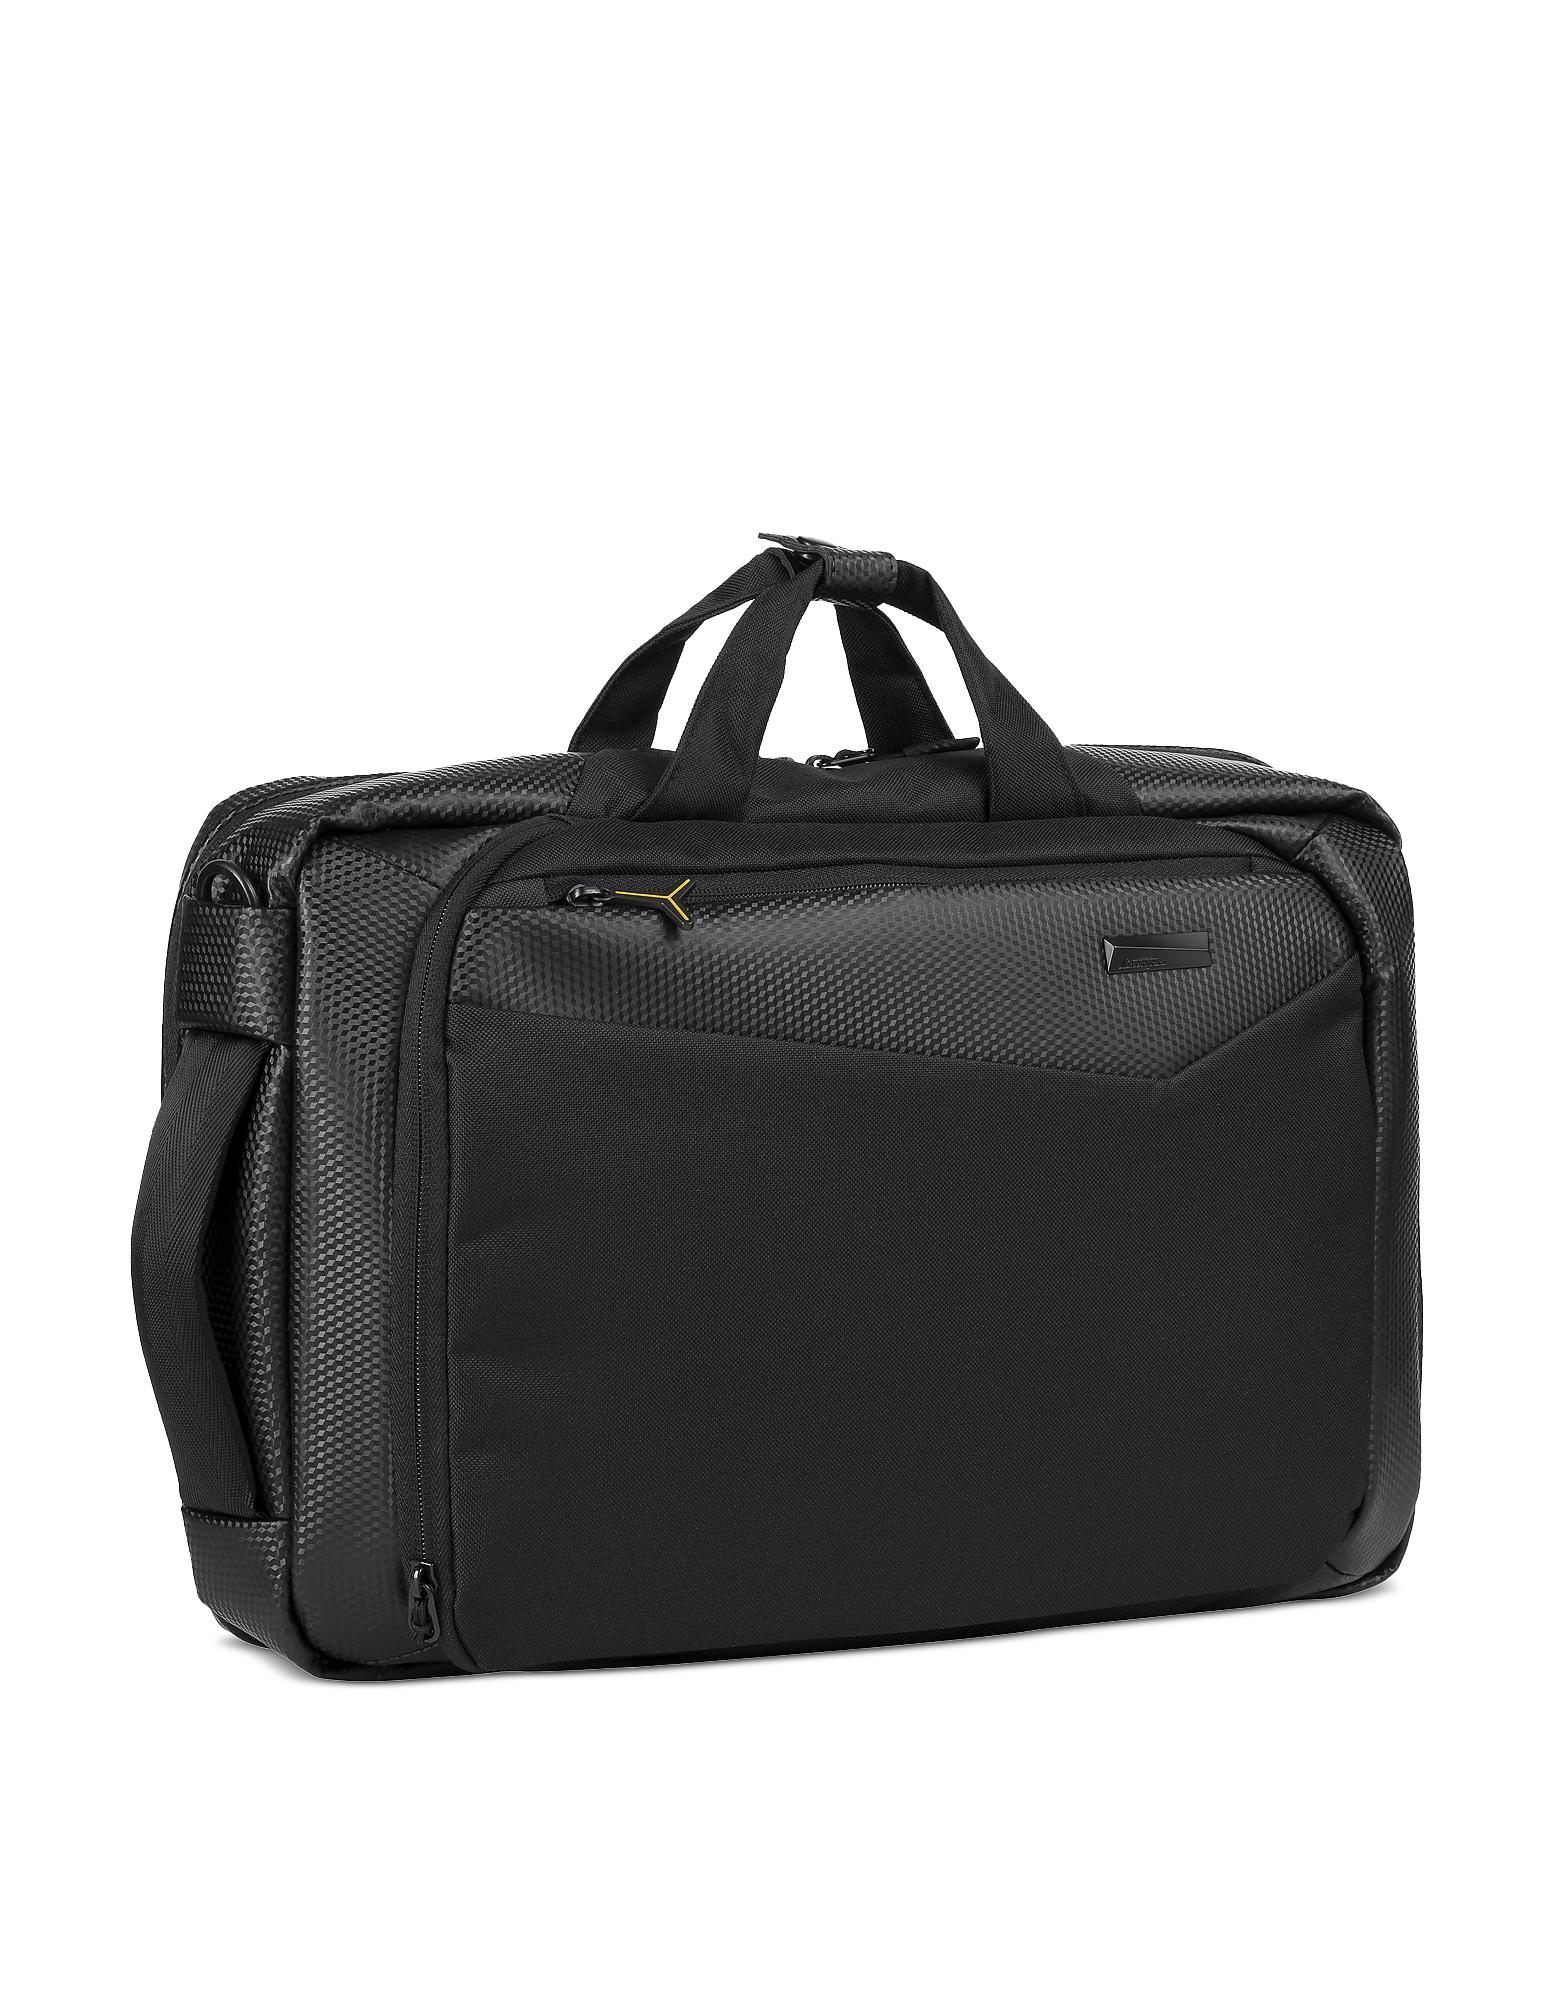 Lamborghini Automobili Designer Men's Bags, Galleria Nylon Men's Backpack W/Handles